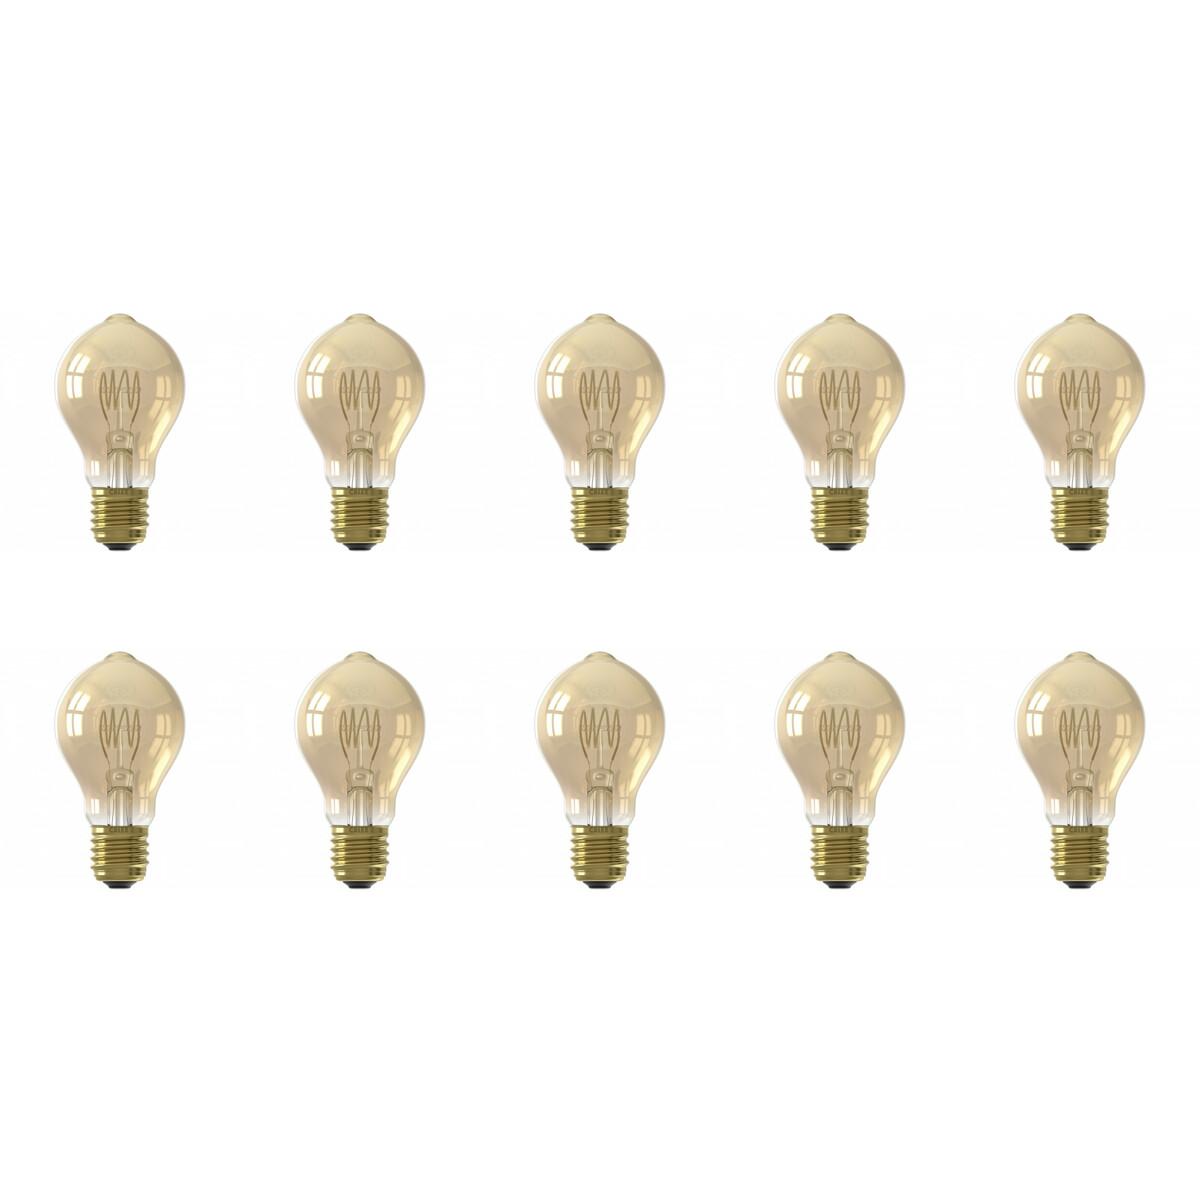 CALEX - LED Lamp 10 Pack - Filament A60 - E27 Fitting - Dimbaar - 4W - Warm Wit 2100K - Amber